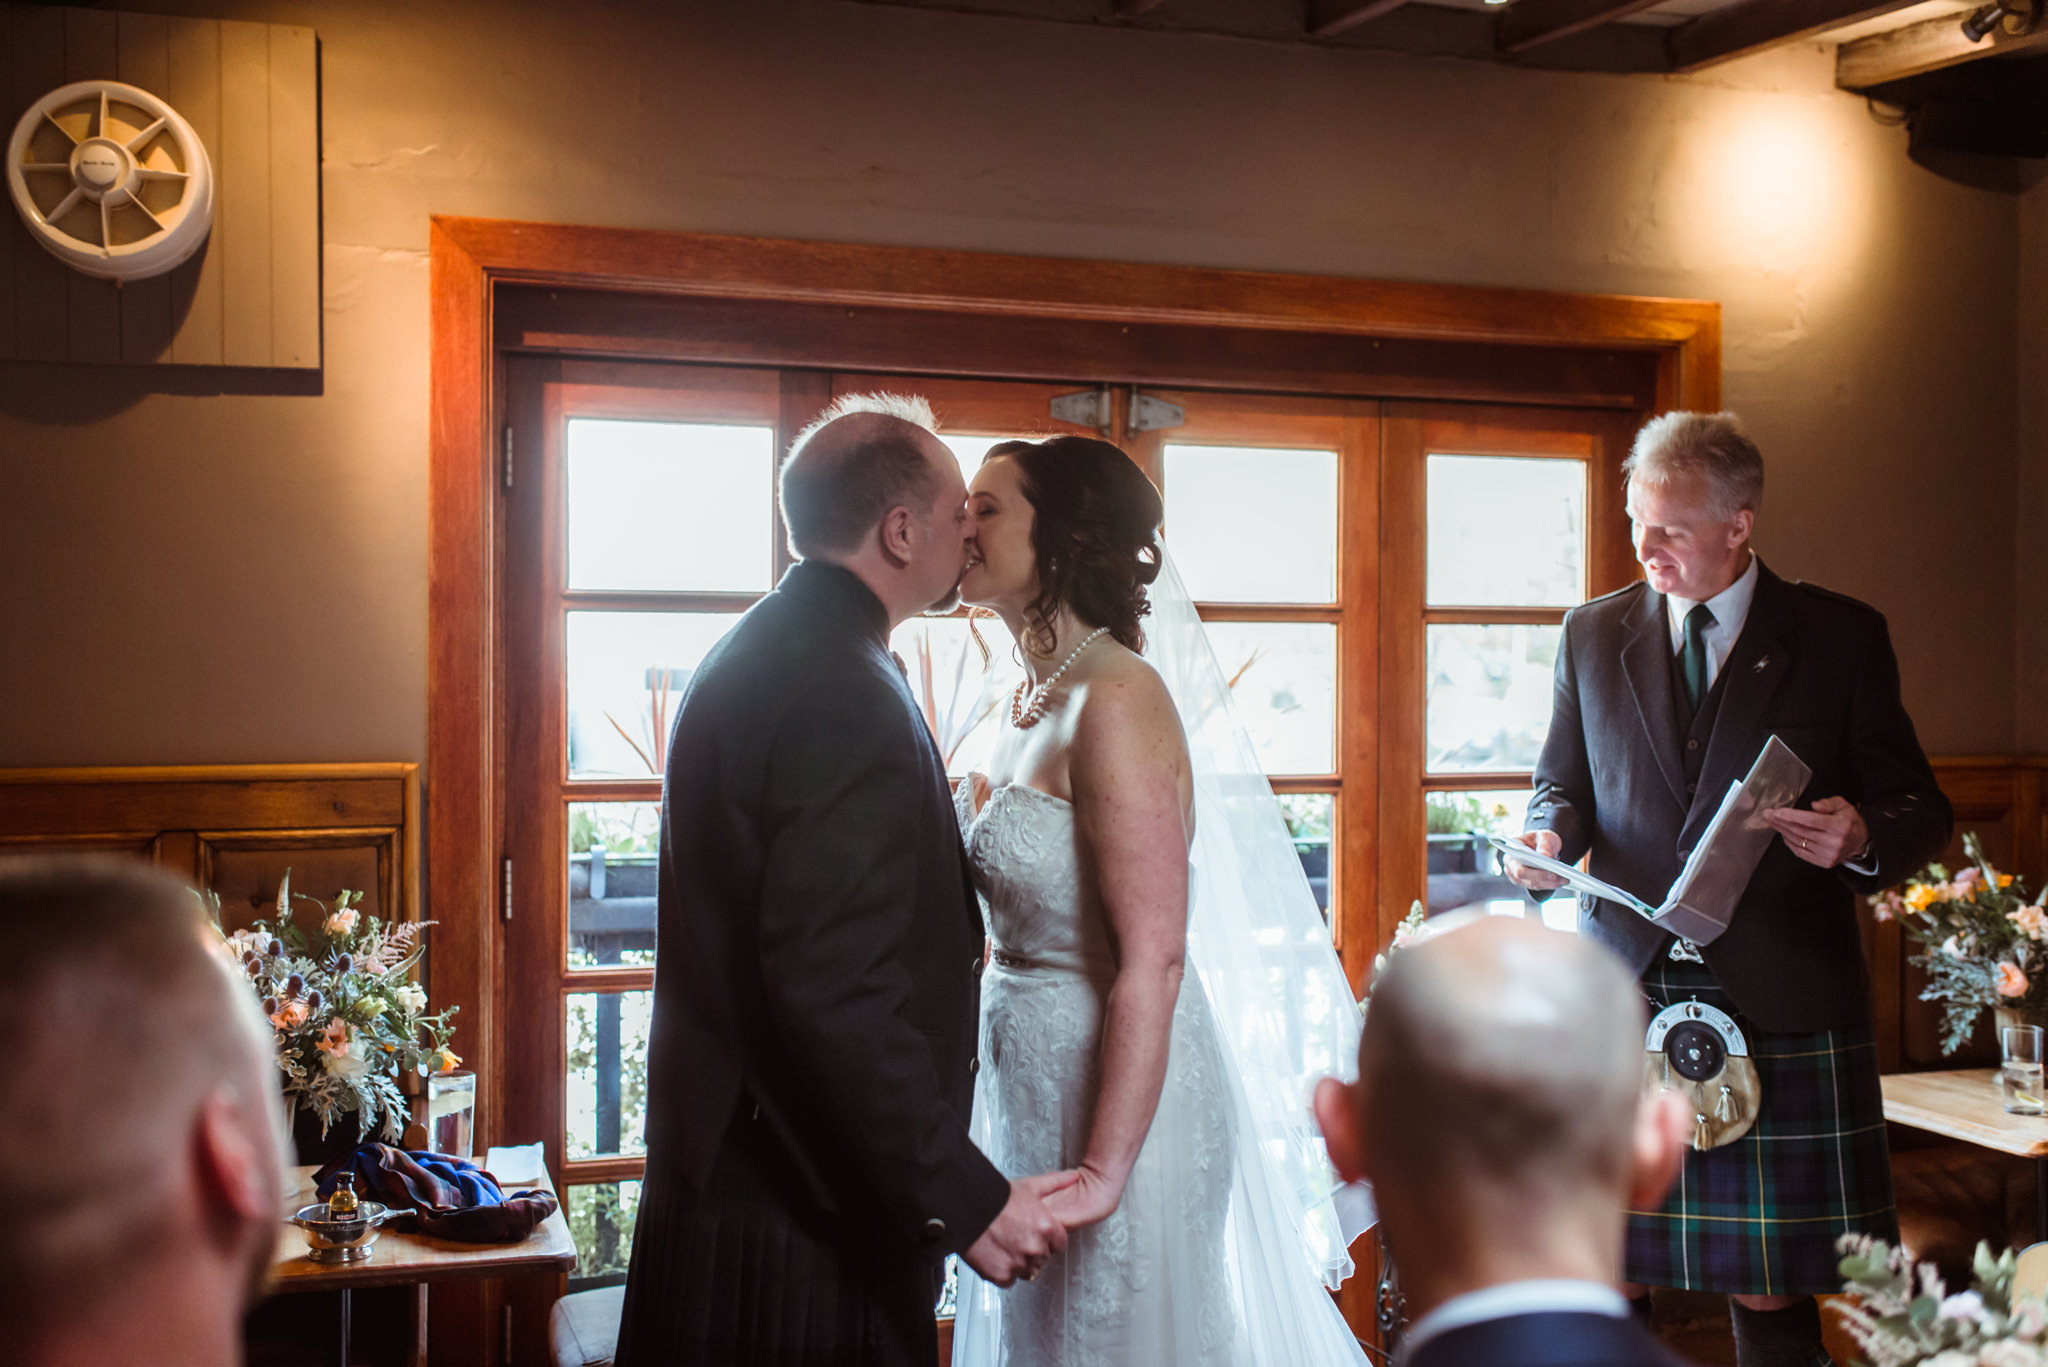 ubiquitous-chip-wedding-(3).jpg